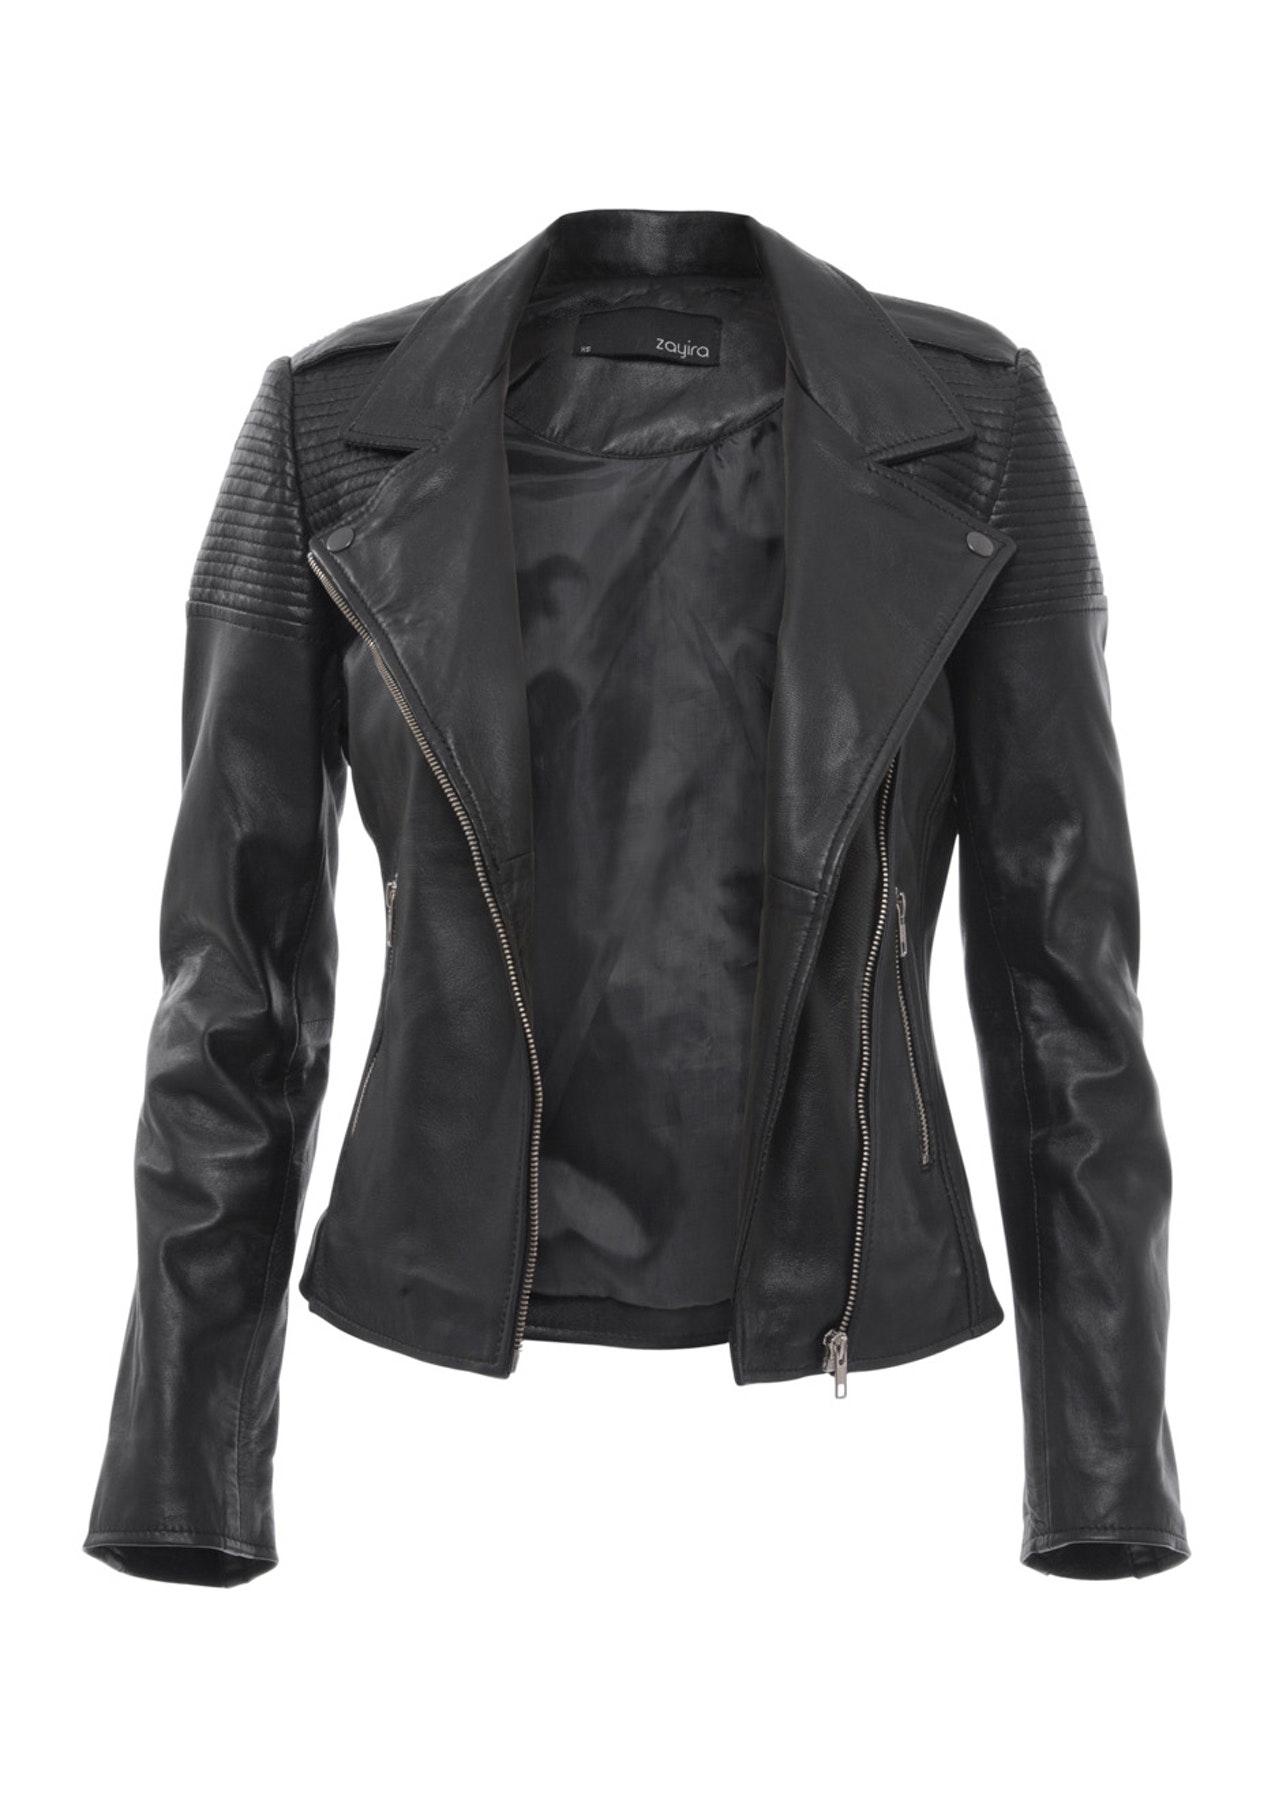 Zayira Moto Moto Leather Jacket - Black